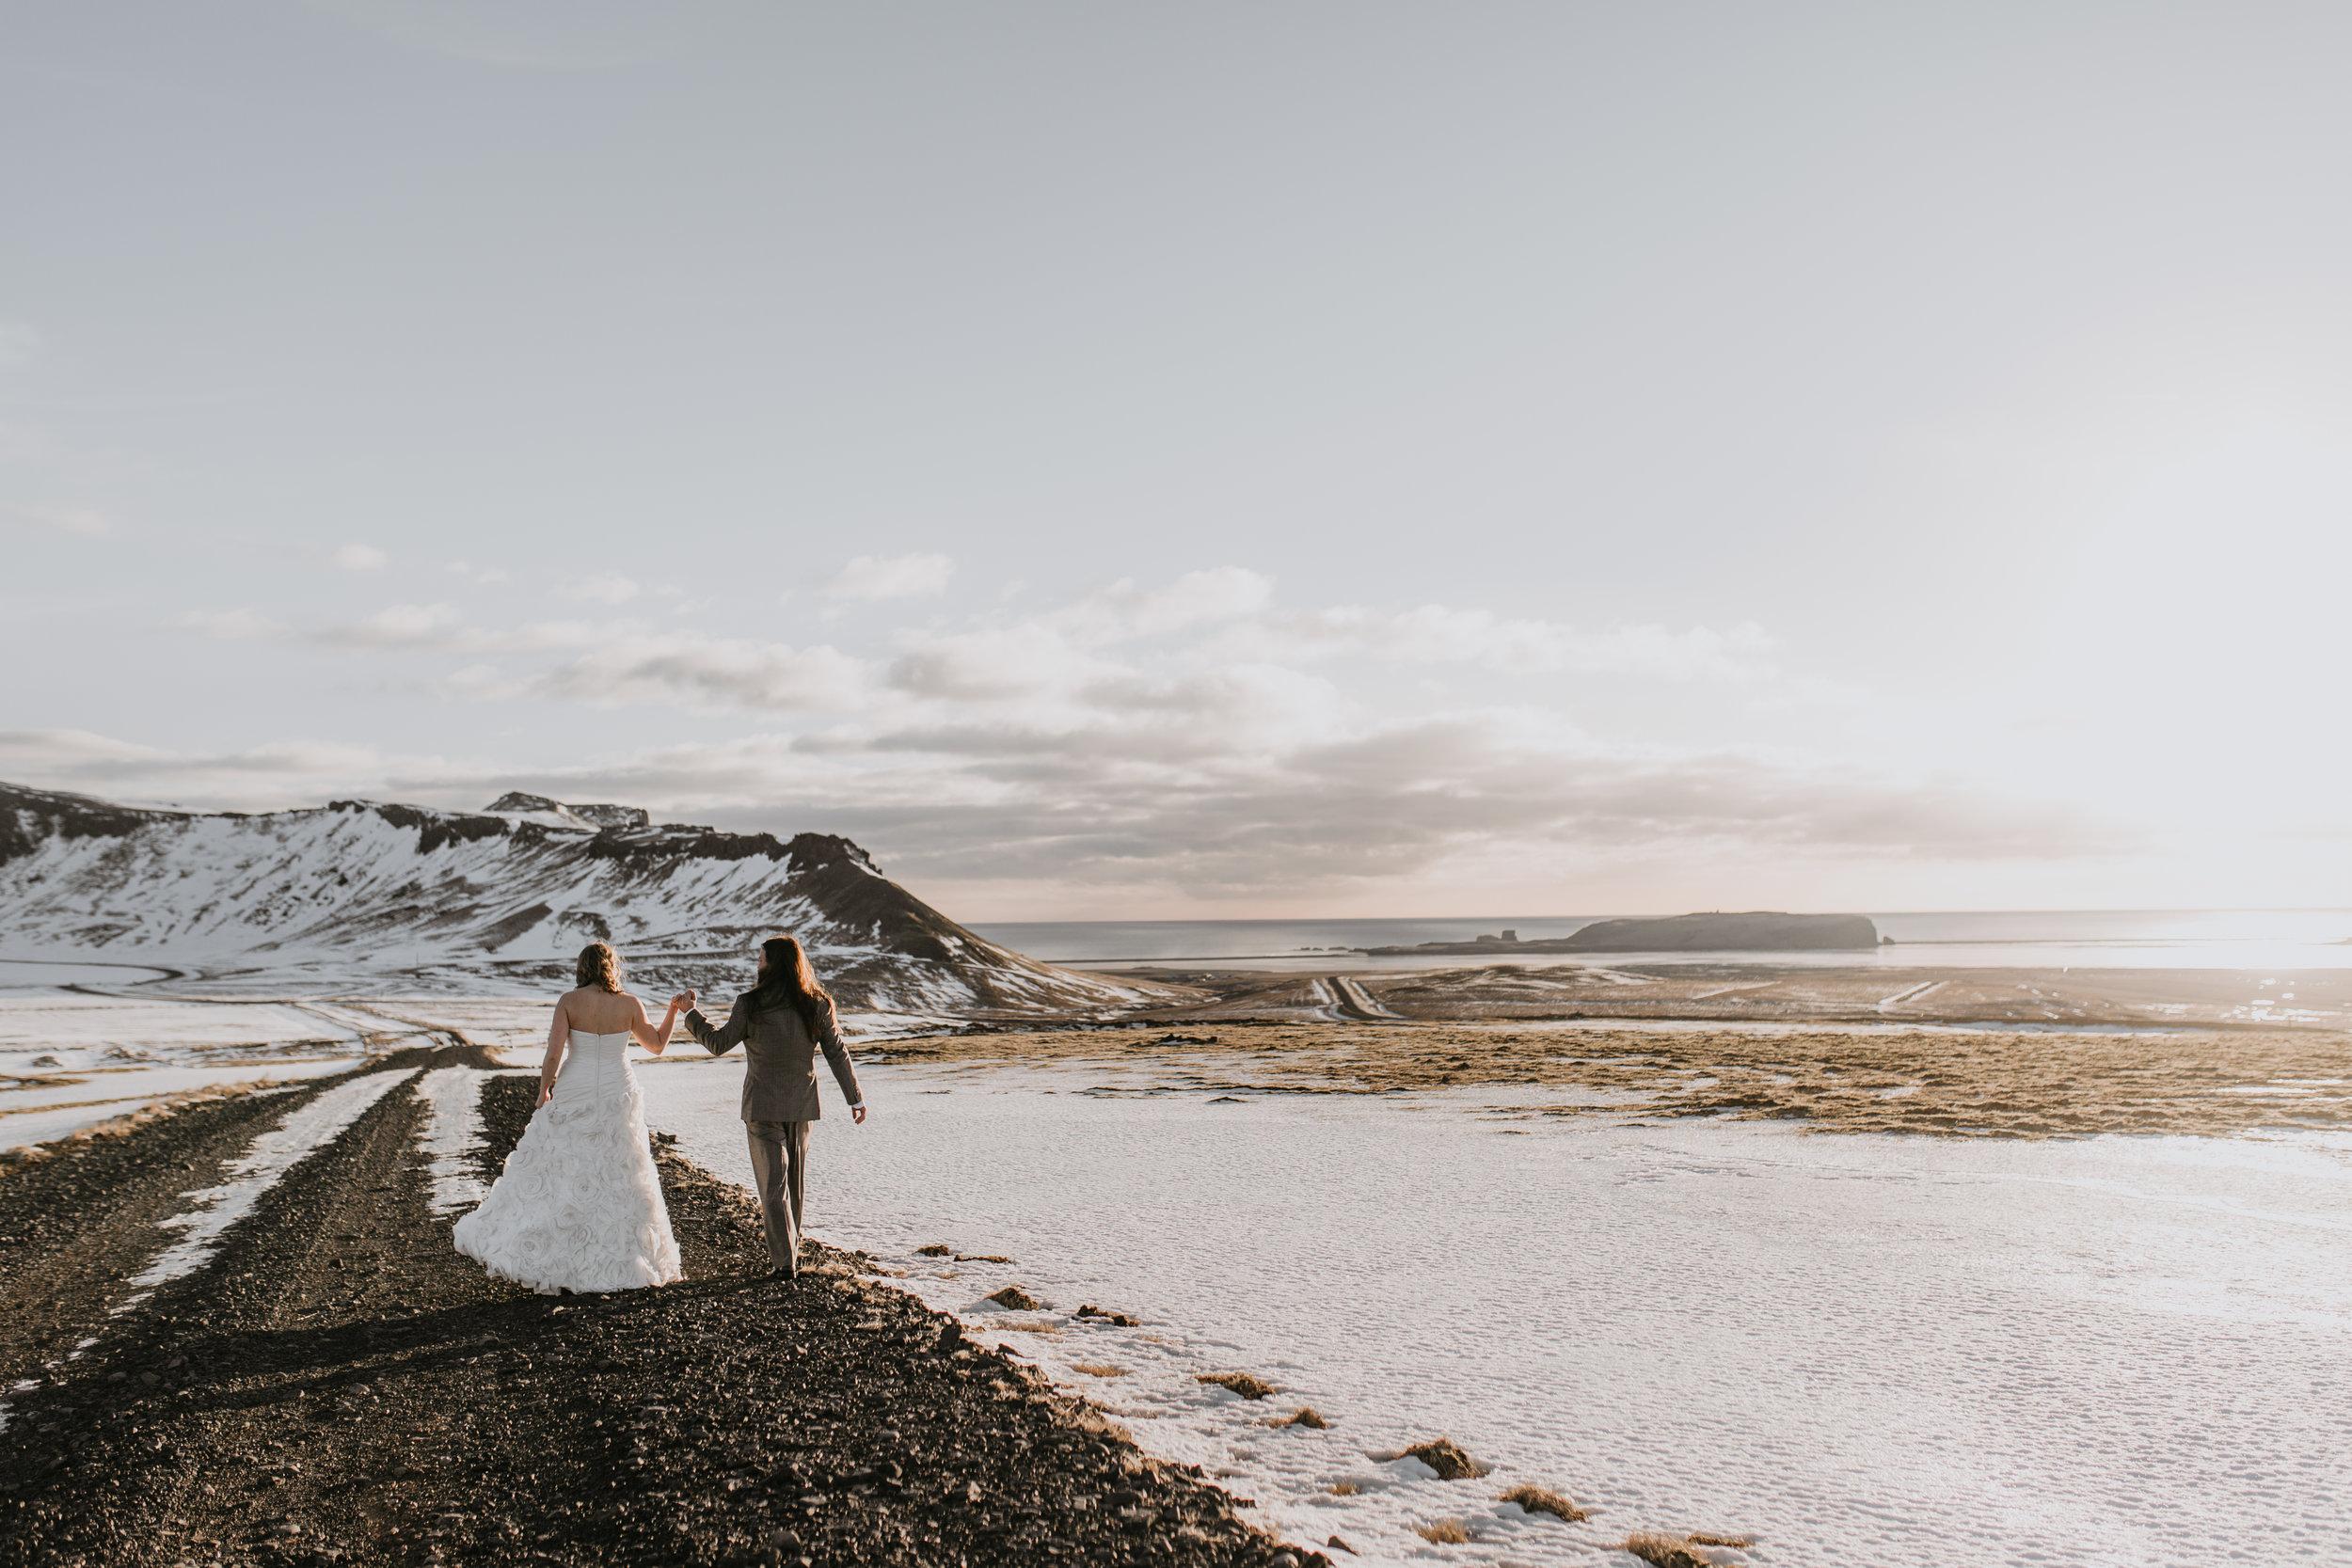 nicole-daacke-photography-iceland-winter-sunset-adventure-elopement-skogafoss-waterfall-black-sand-beach-dyrholaey-vik-iceland-intimate-wedding-black-church-elopement-photographer-14.jpg